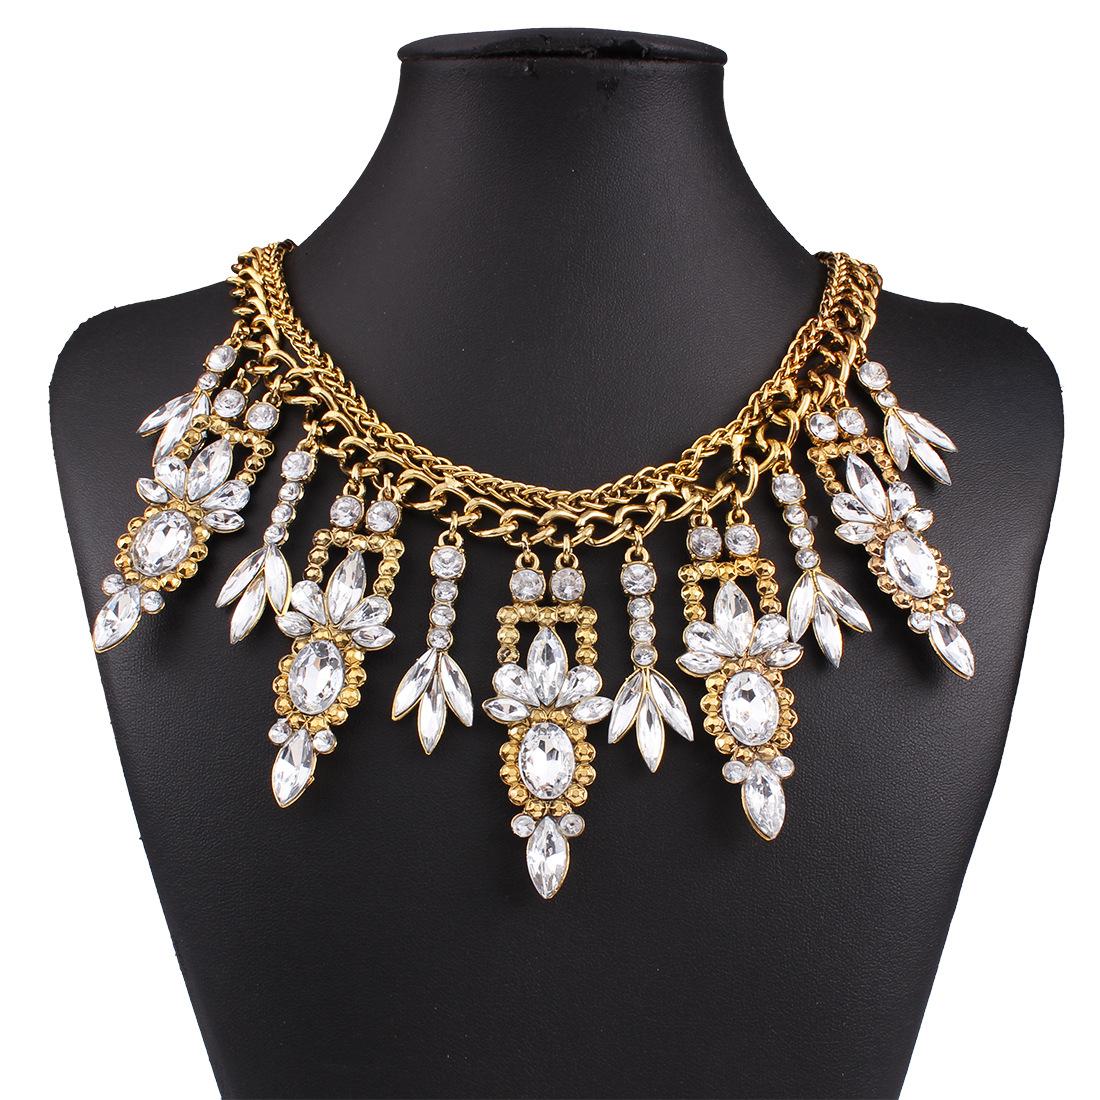 2016 new fashion koly big chunky necklace collie